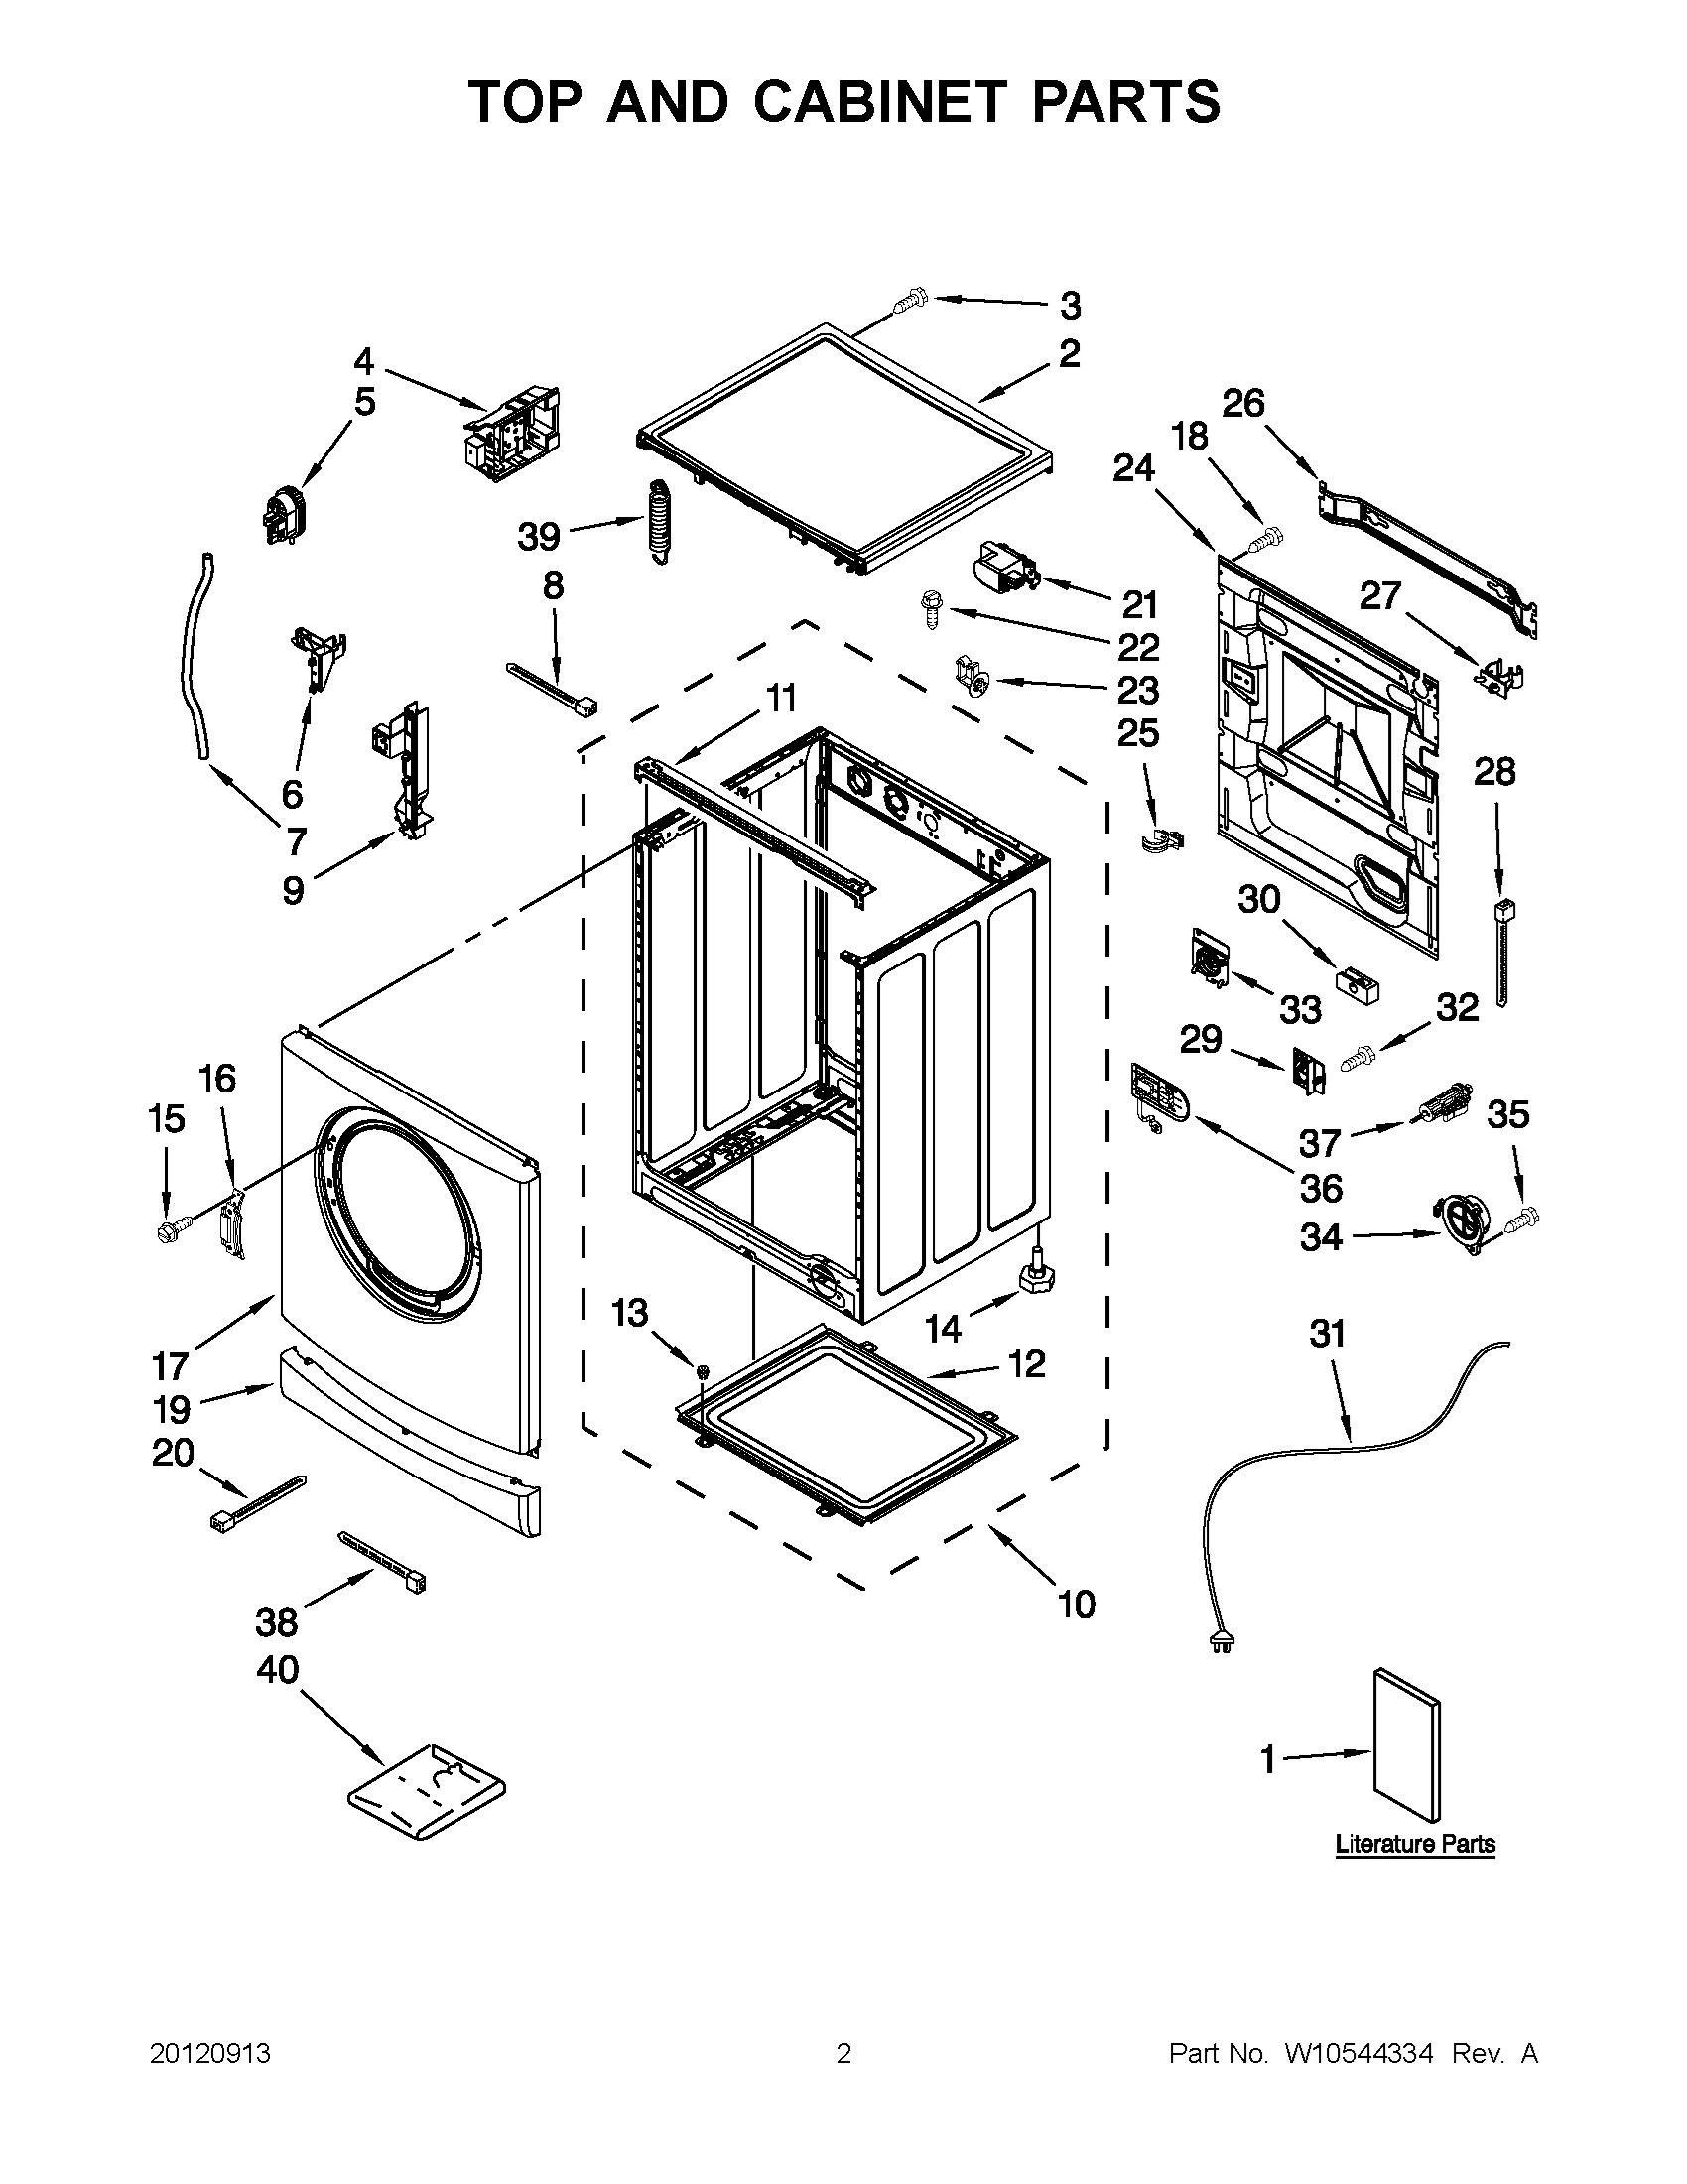 WhirlpoolImg_19000101 20150716_00203213?width=1000 wfc7500vw2 whirlpool corporation,Wire Diagram Whirlpool Mcu